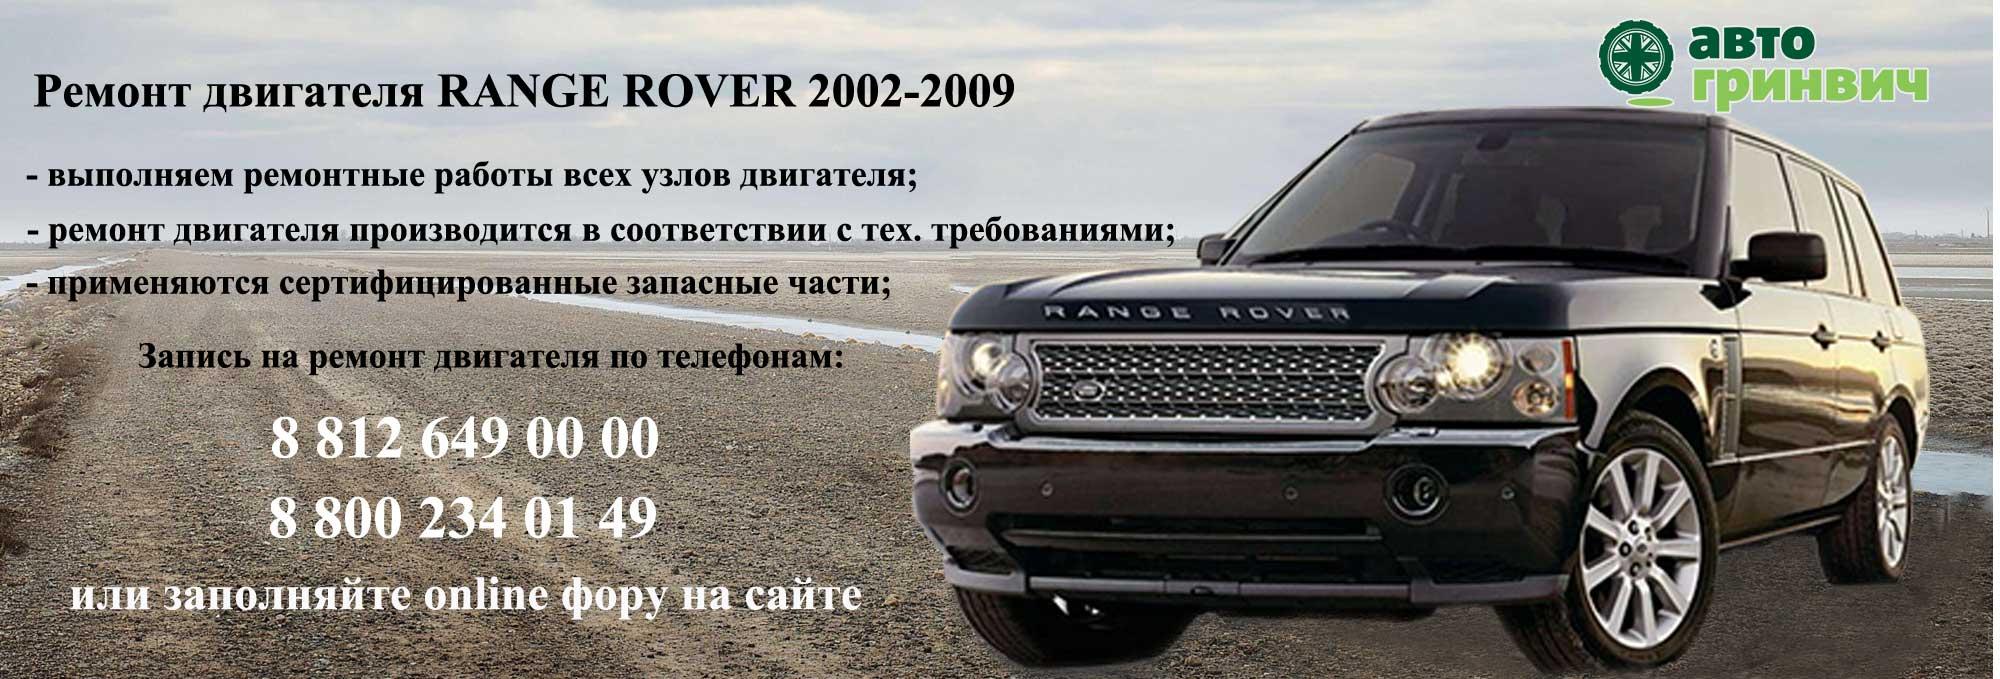 Ремонт двигателя RANGE ROVER 2002-2009